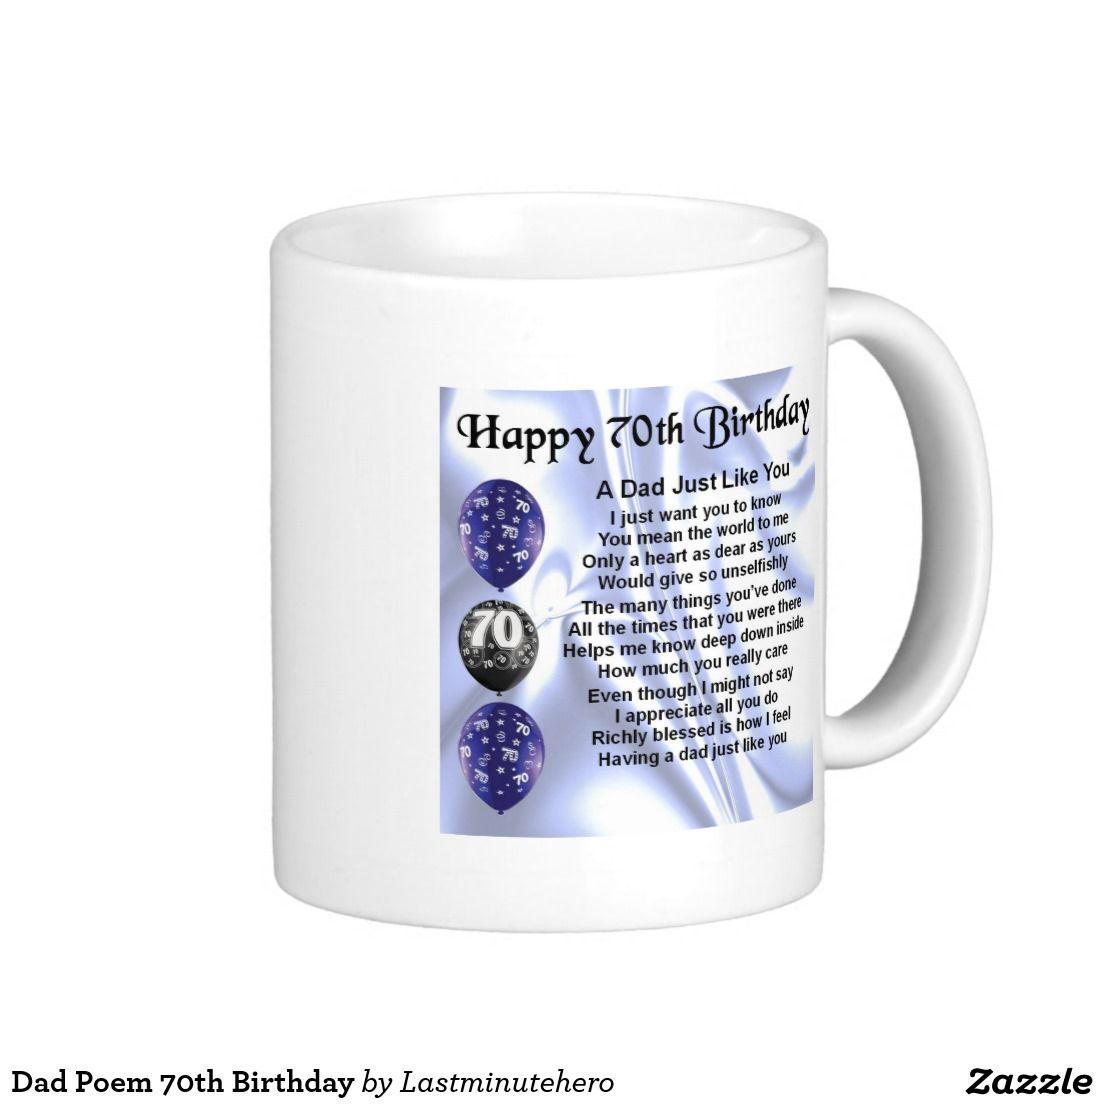 Dad Poem 70th Birthday Coffee Mug